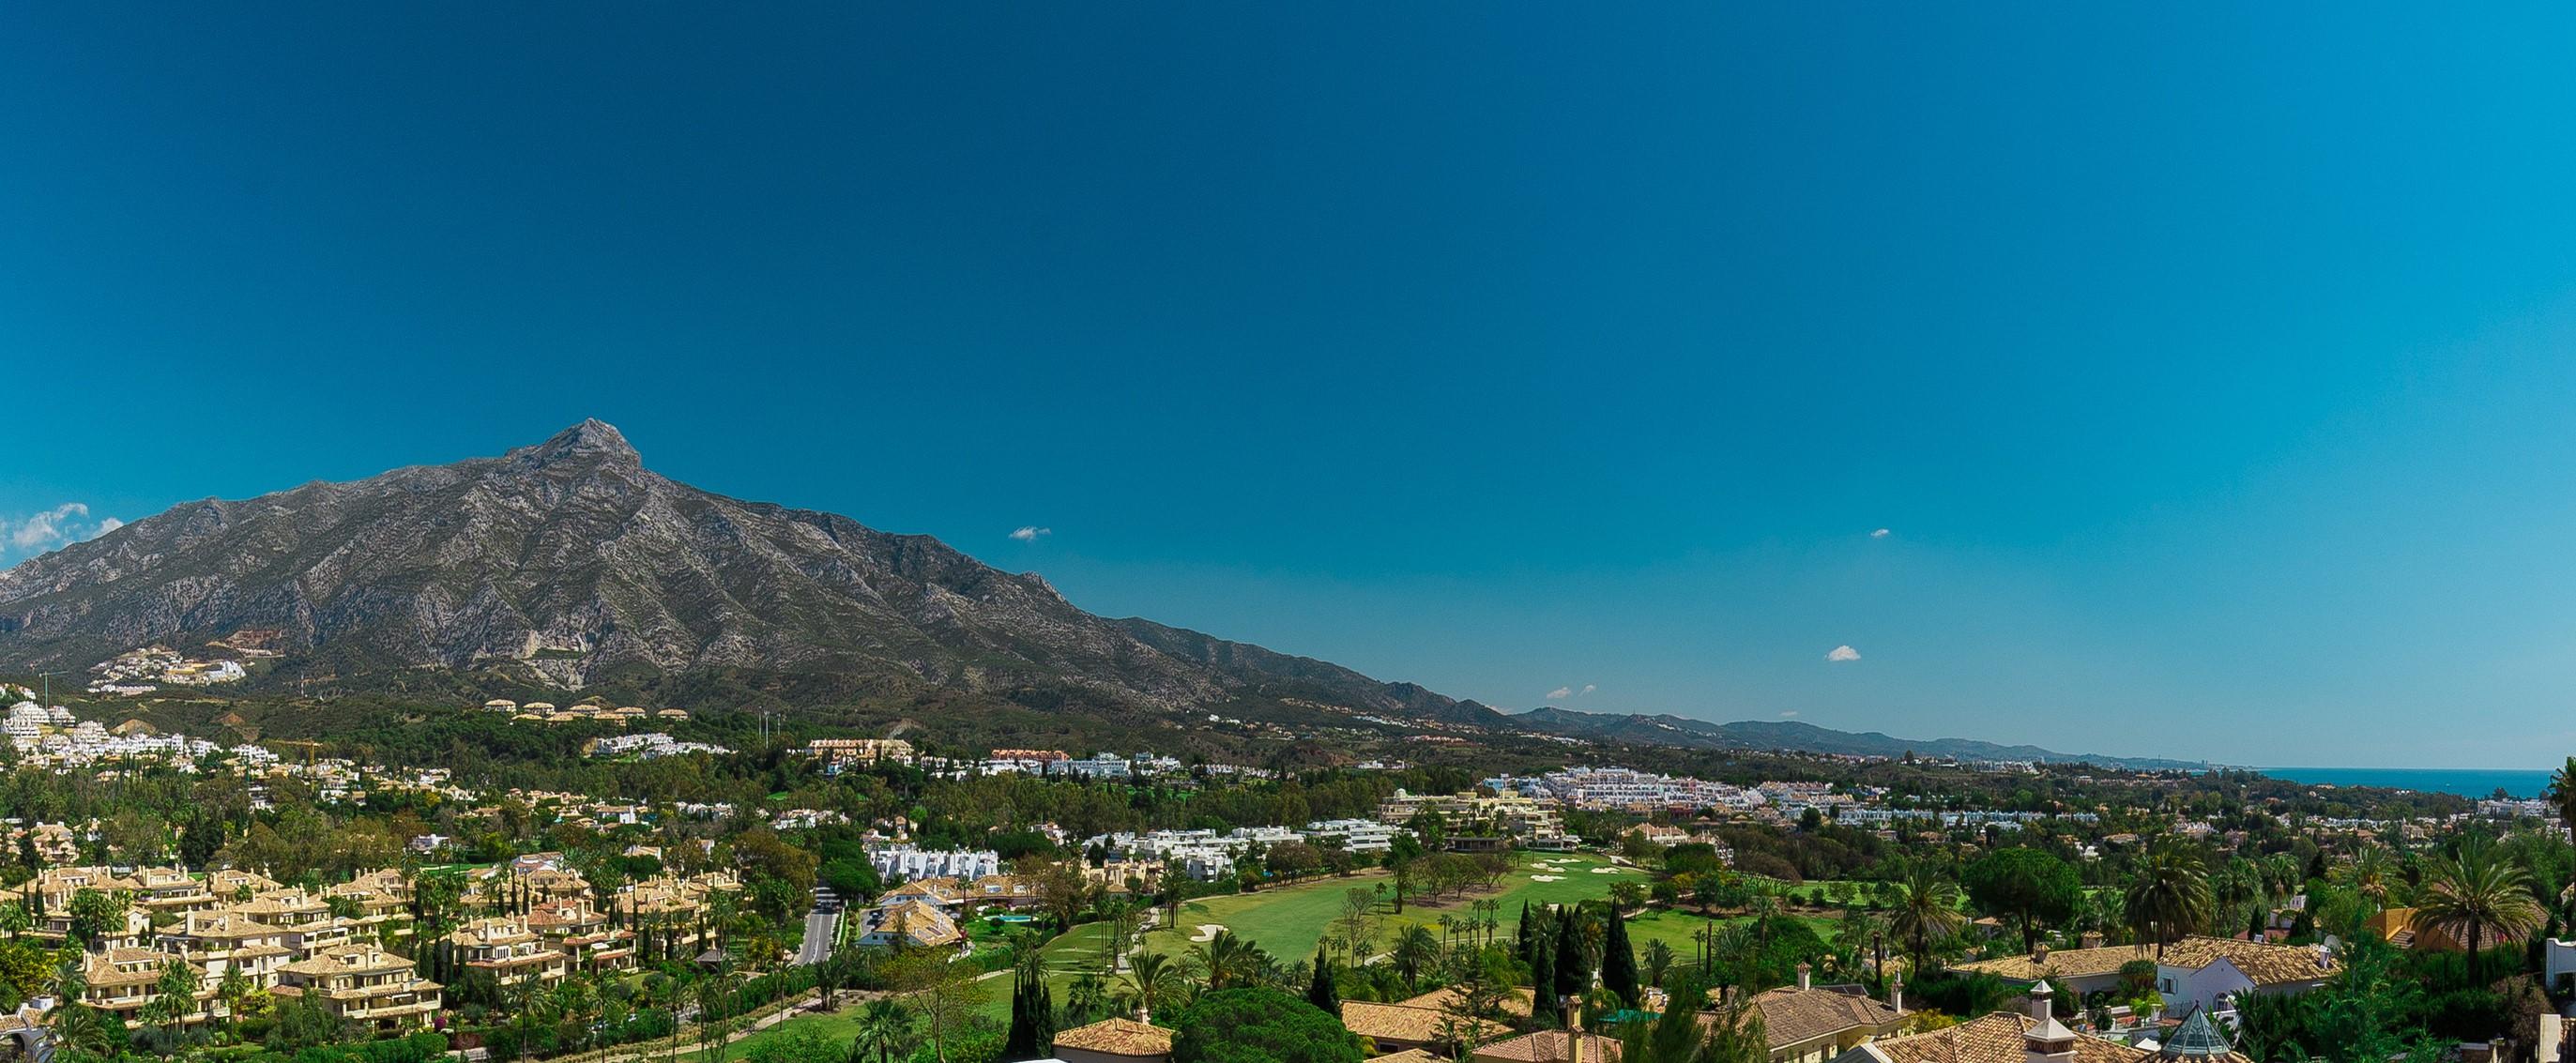 Nueva Andalucía, Marbella's ideal family address